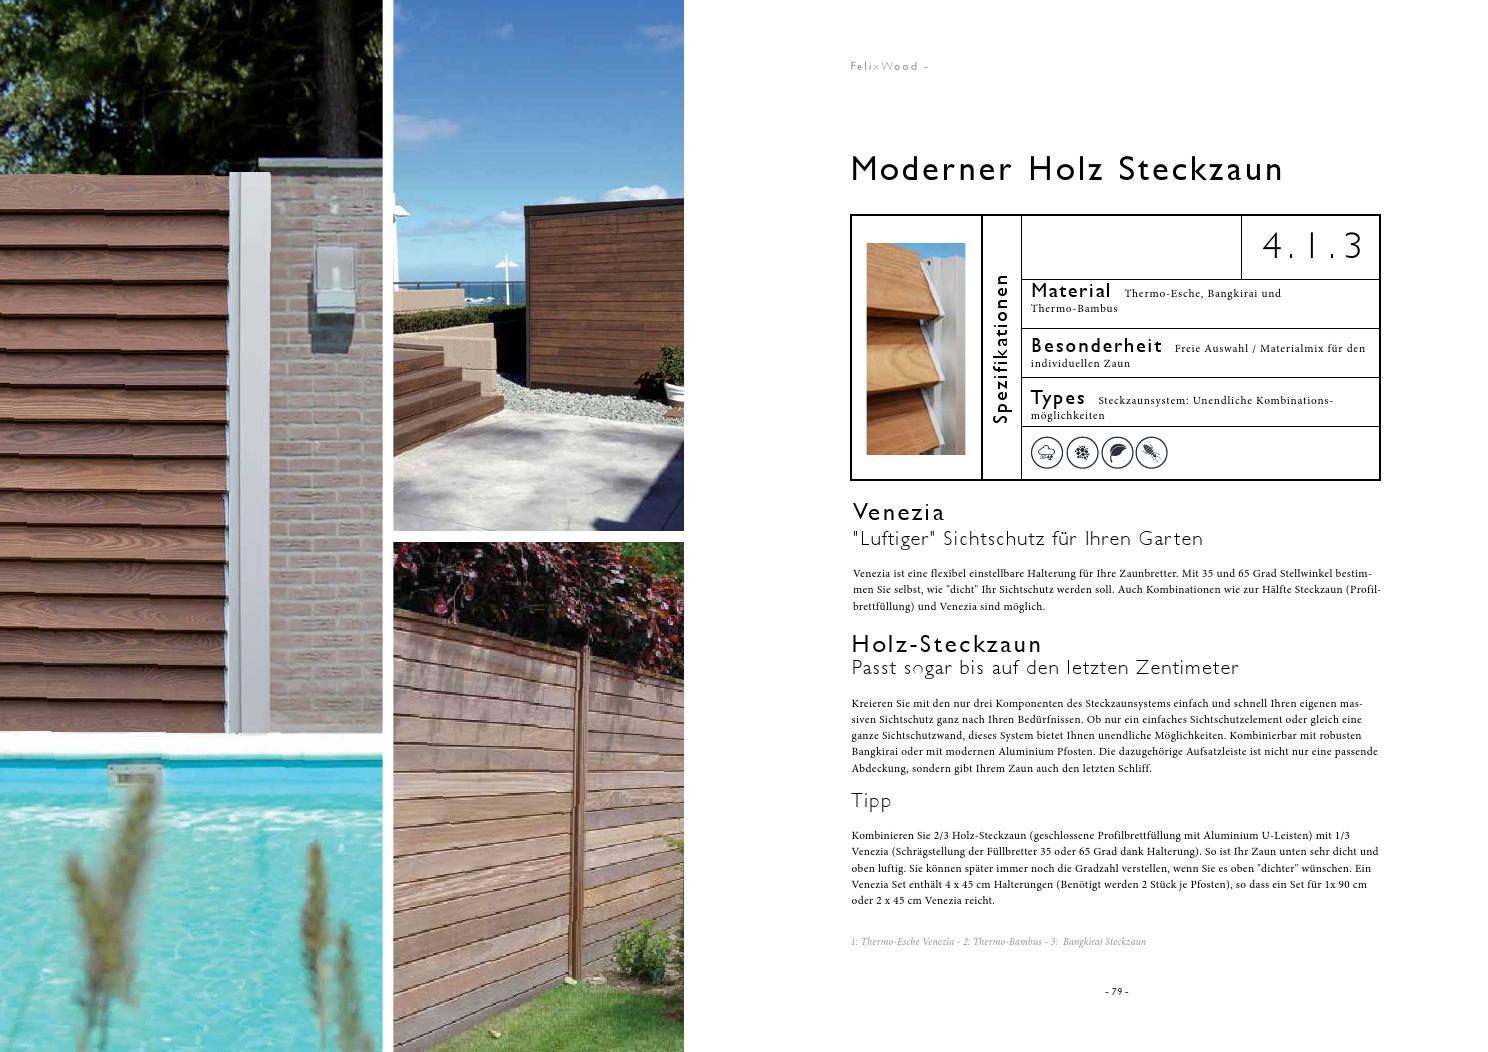 Terrassenboden Und Sichtschutz Felix Clercx Katalog By Tomwood Ag